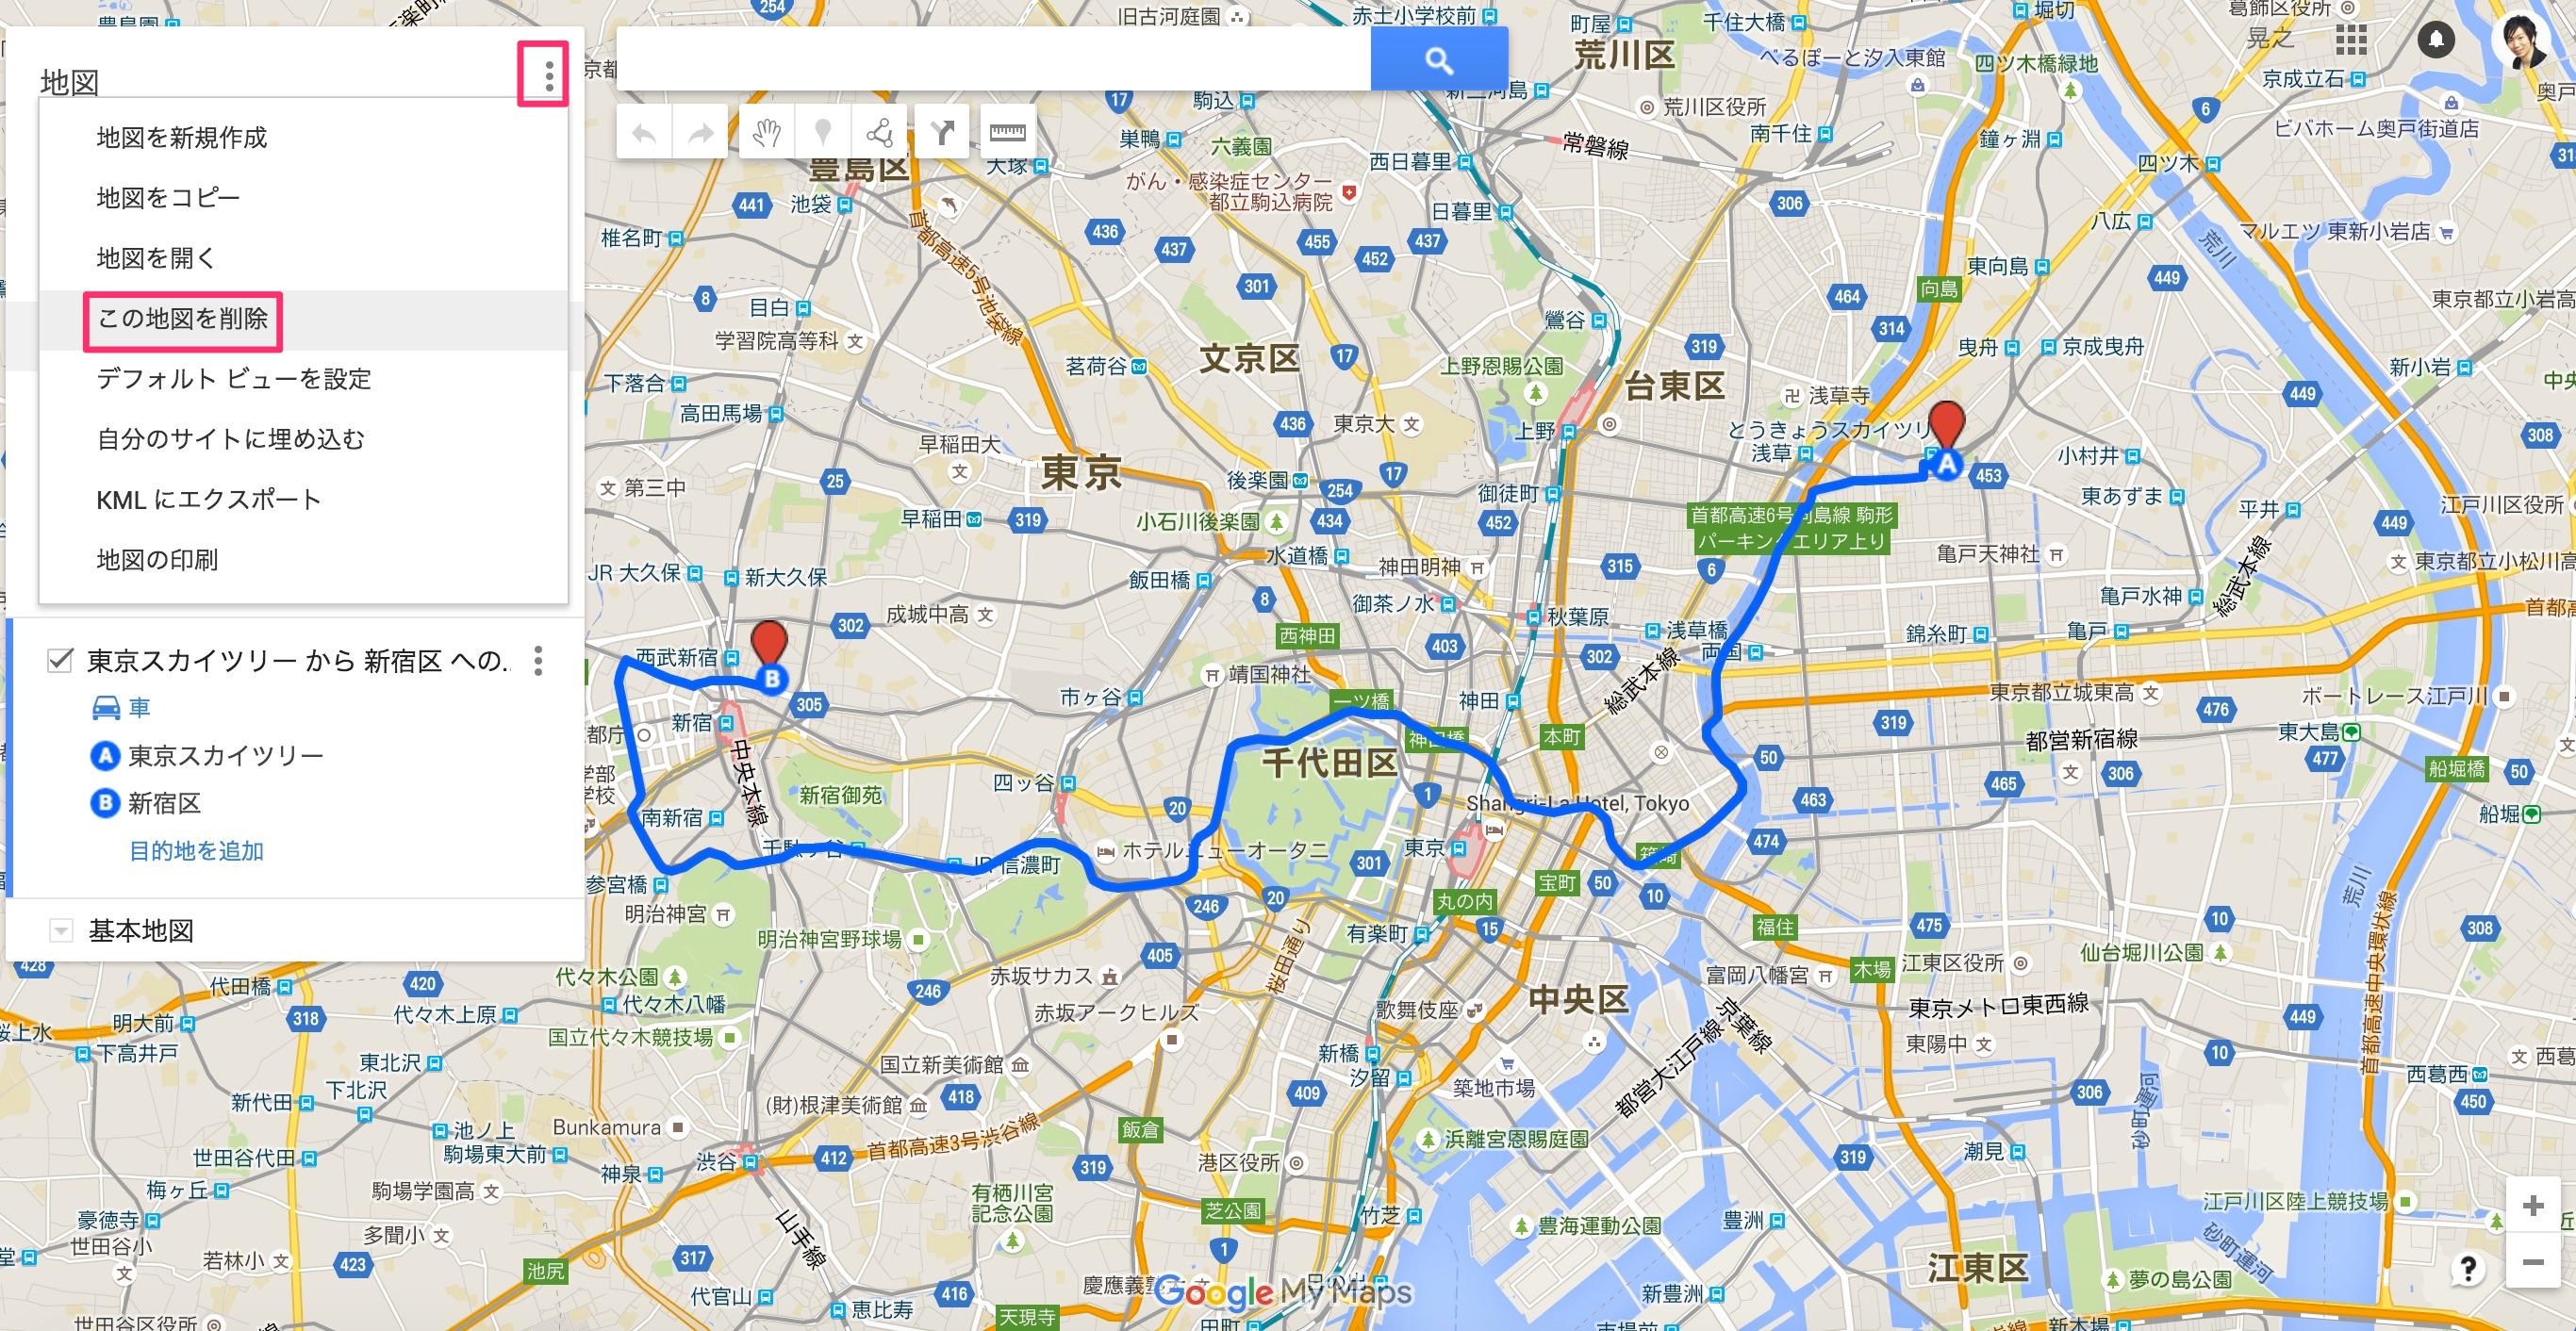 googlemapの自作地図の埋め込み3